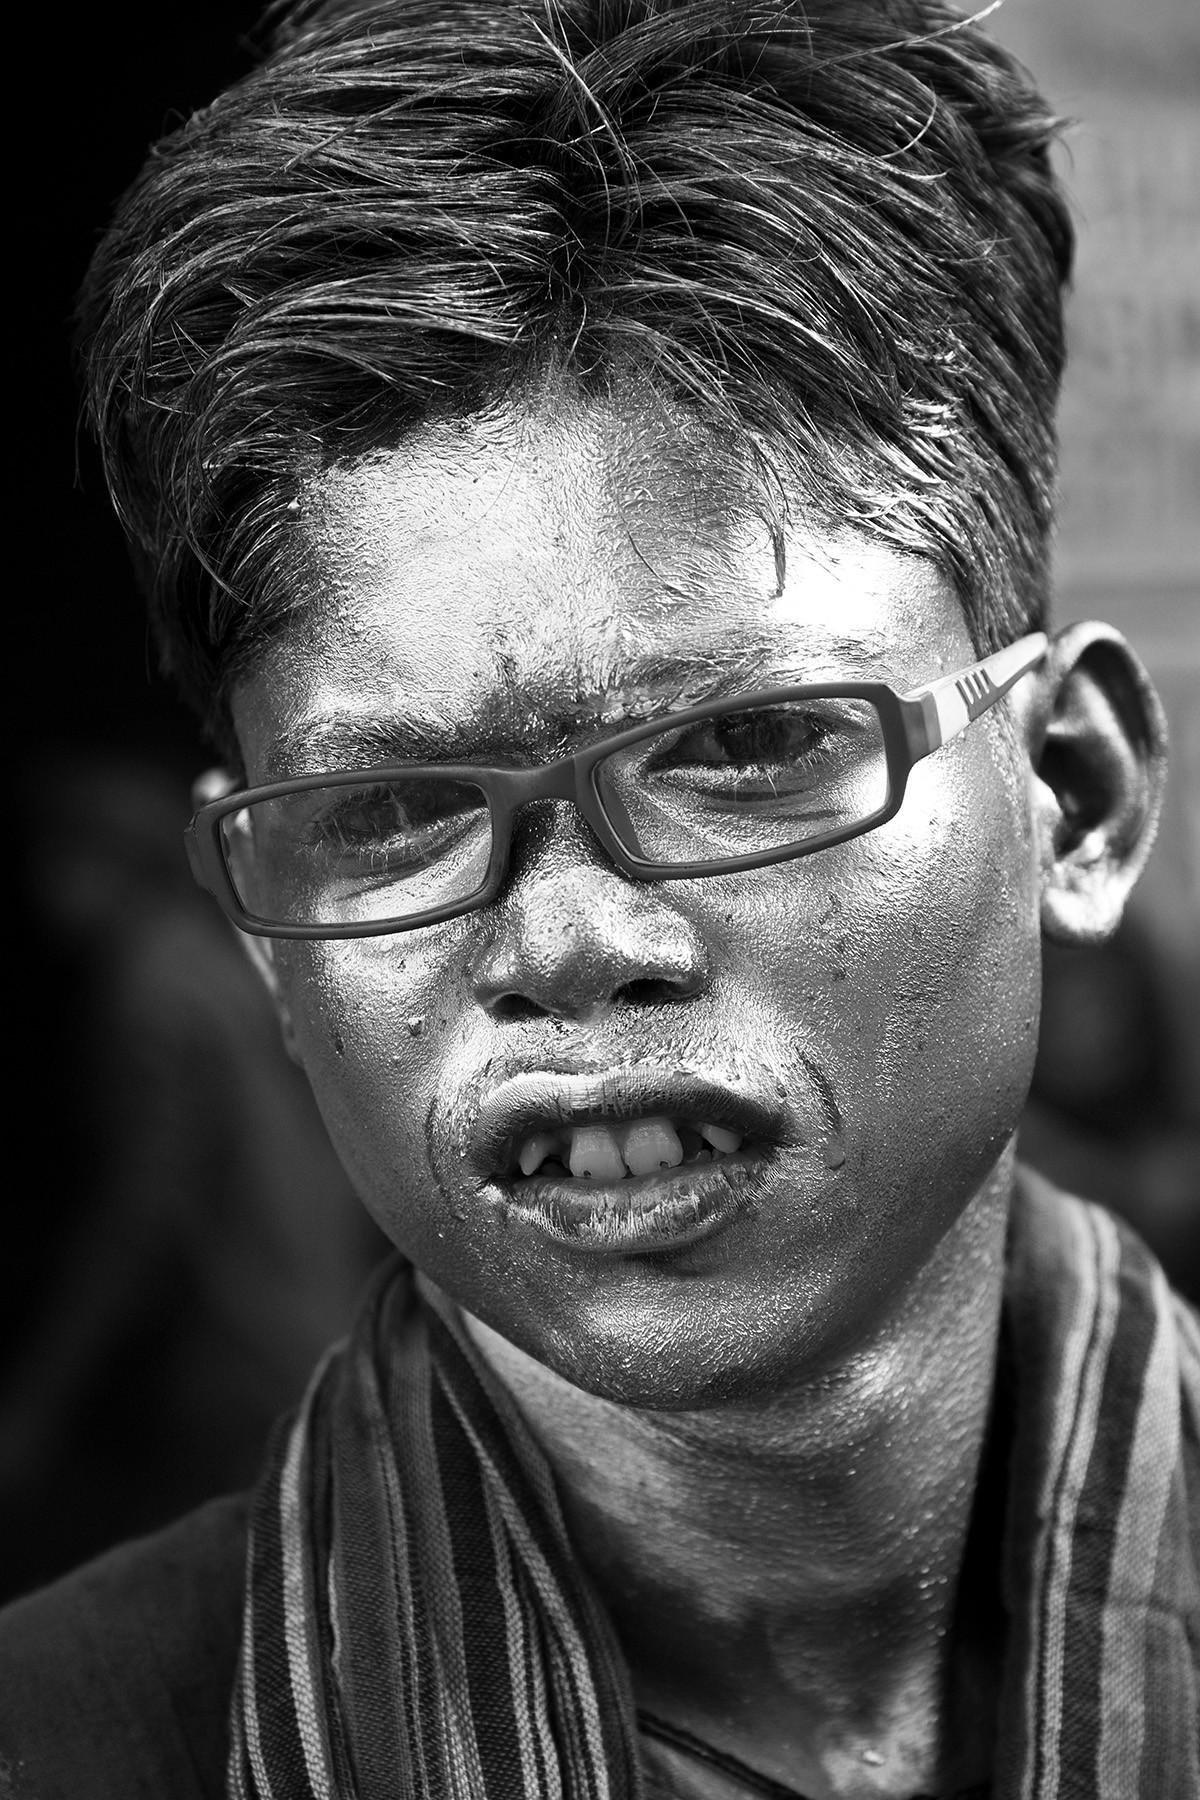 Banaras 01 by Arunkumar Mishra, Image Photograph, Digital Print on Paper, Gray color